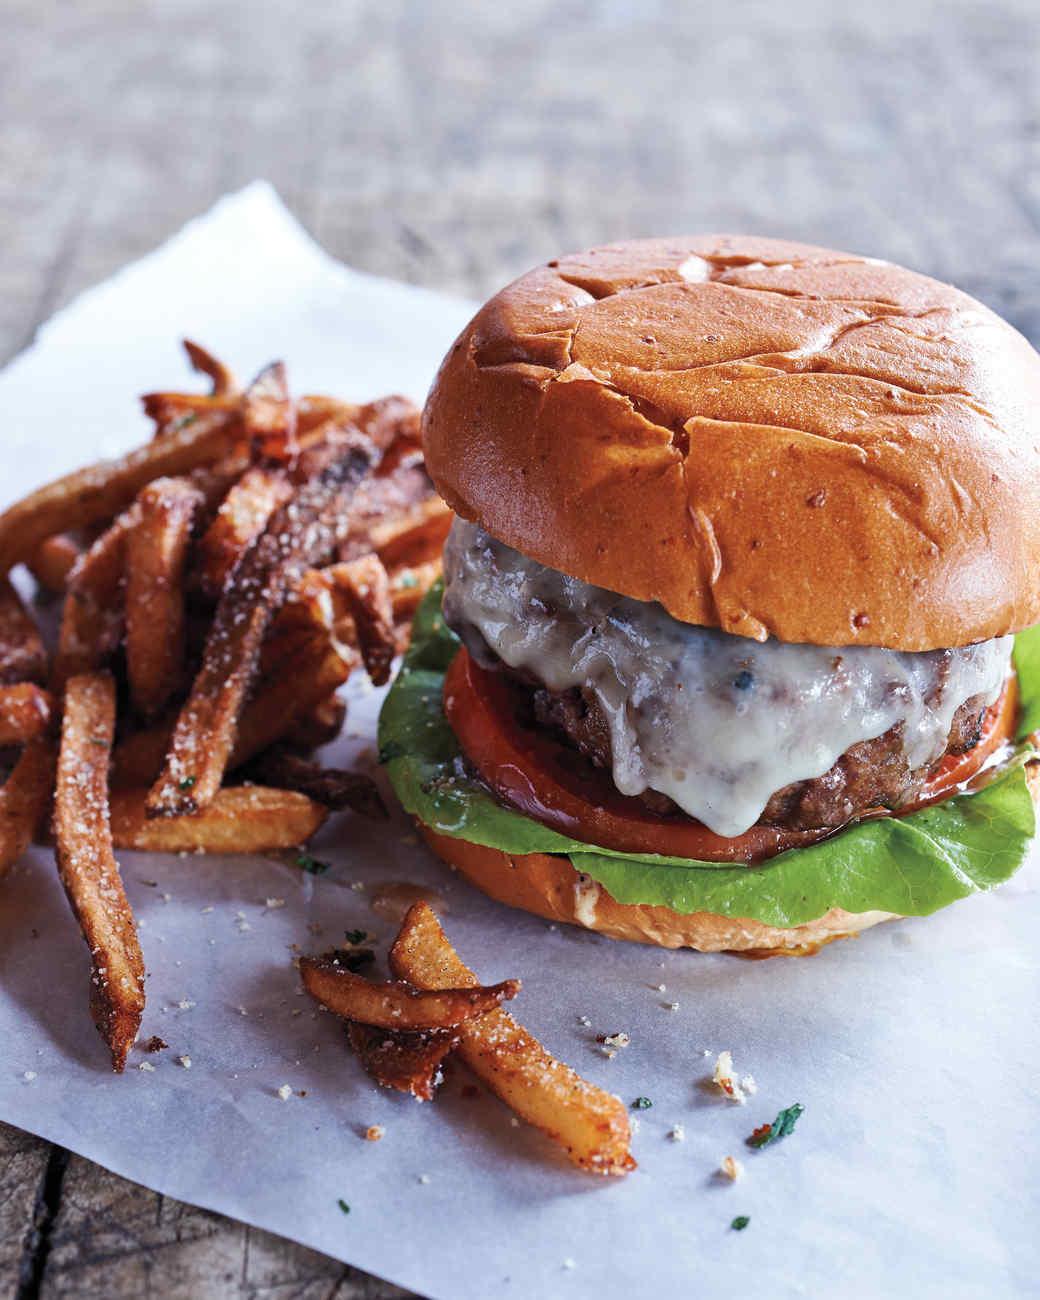 wyebrook-farm-hamburger-french-fries-05-011-d111590.jpg